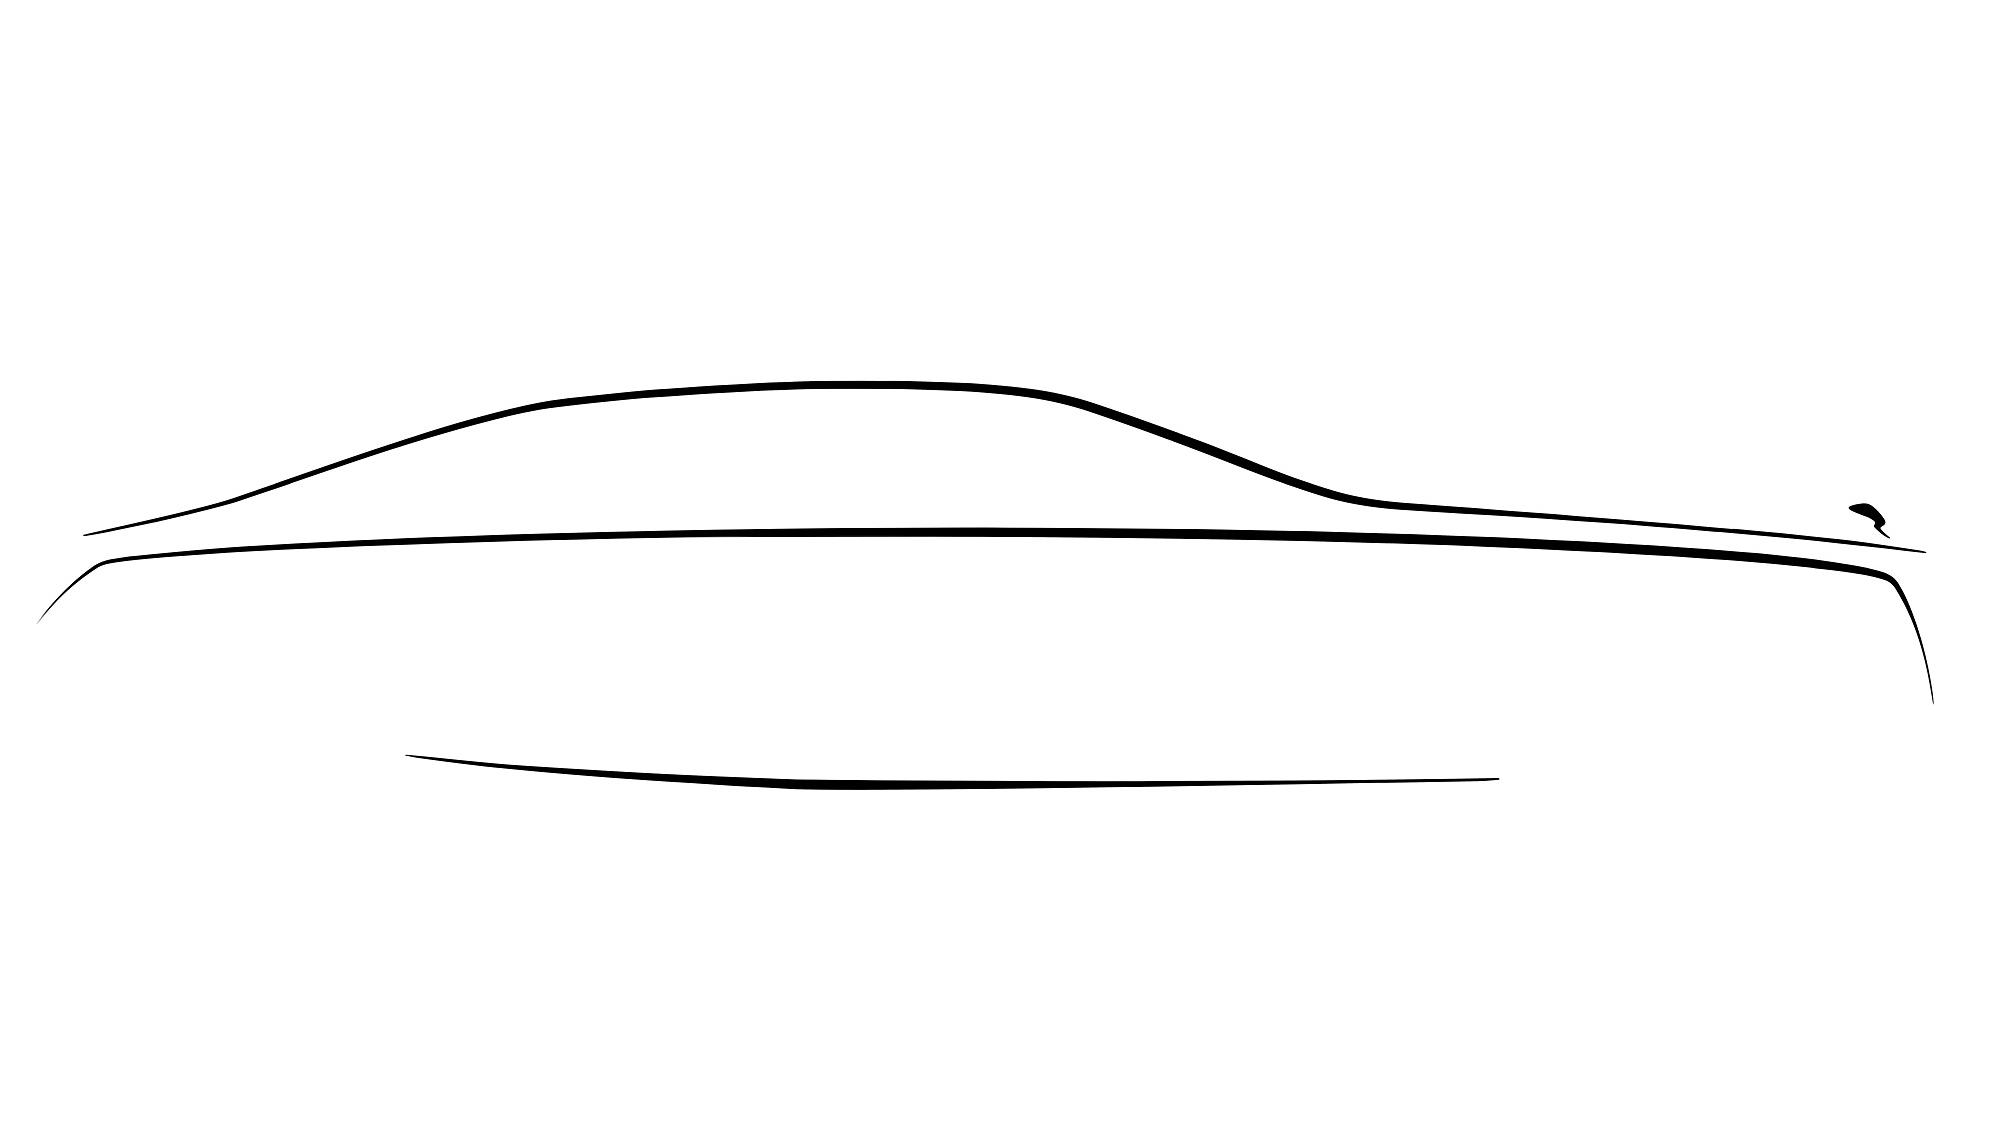 Тизер нового Rolls-Royce Ghost: